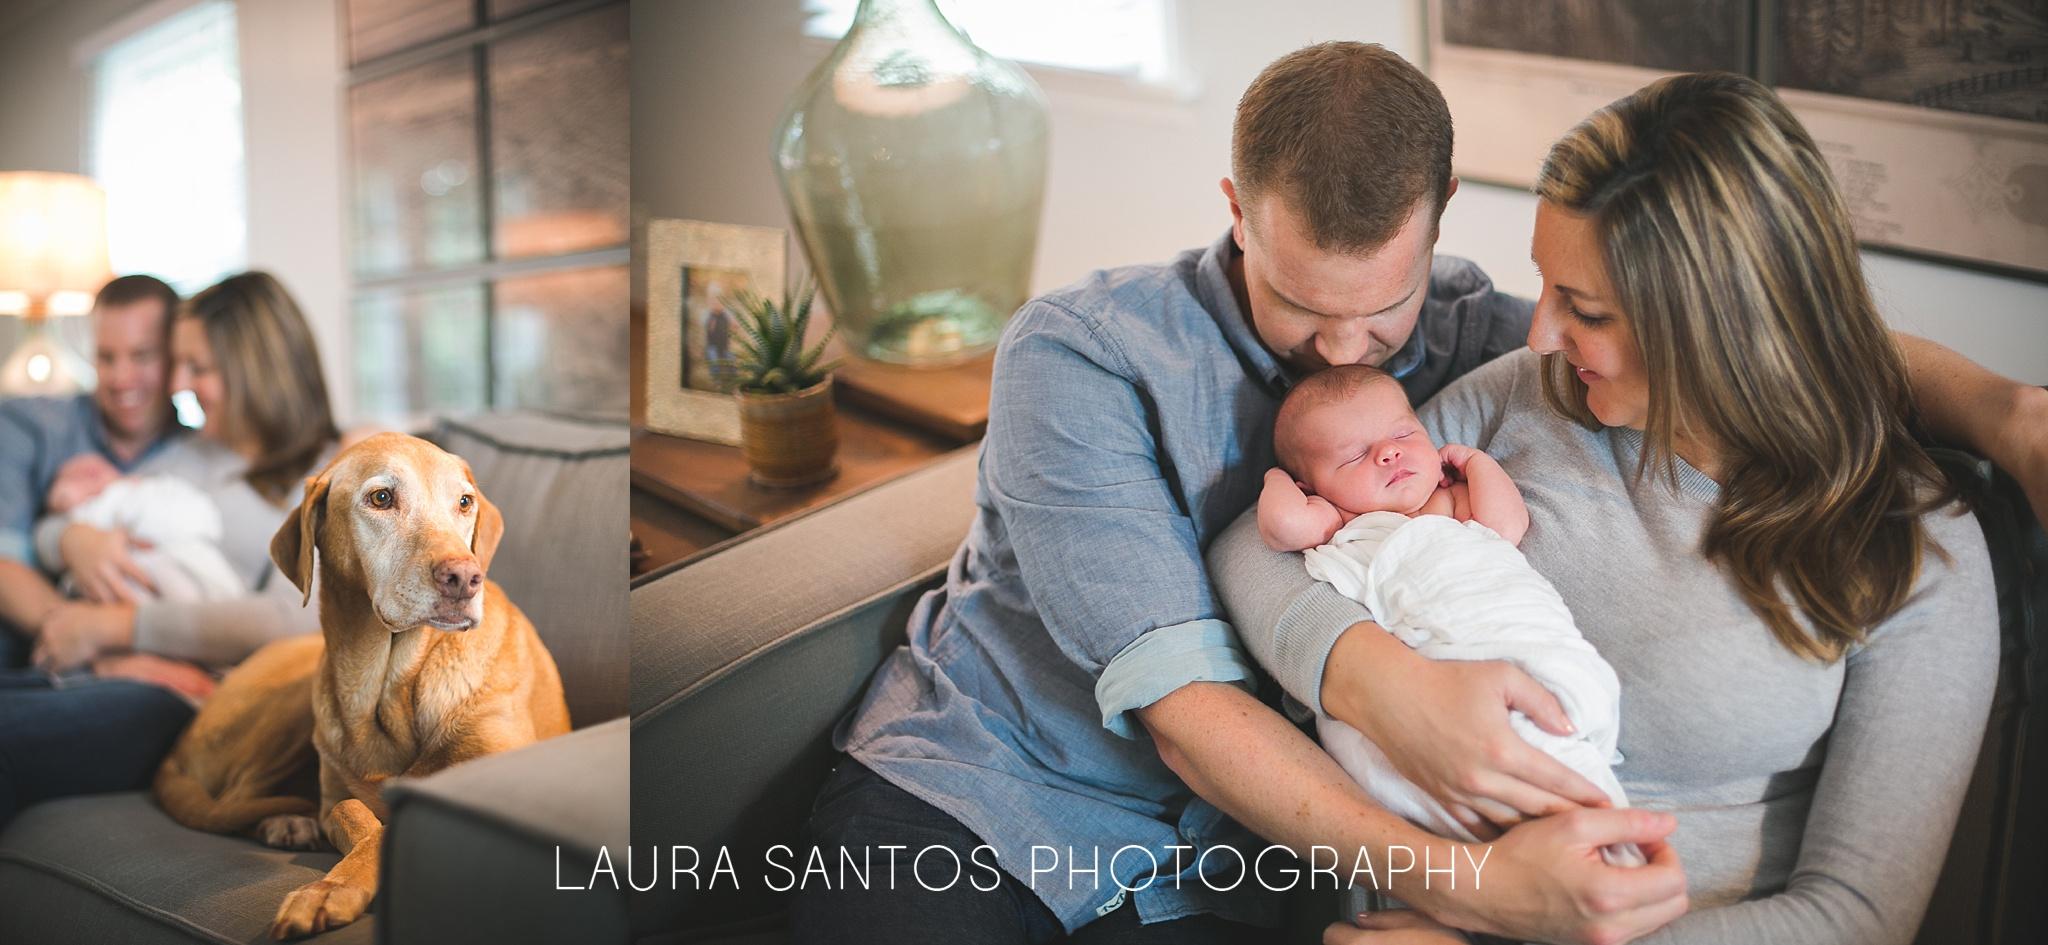 Laura Santos Photography Portland Oregon Family Photographer_0197.jpg